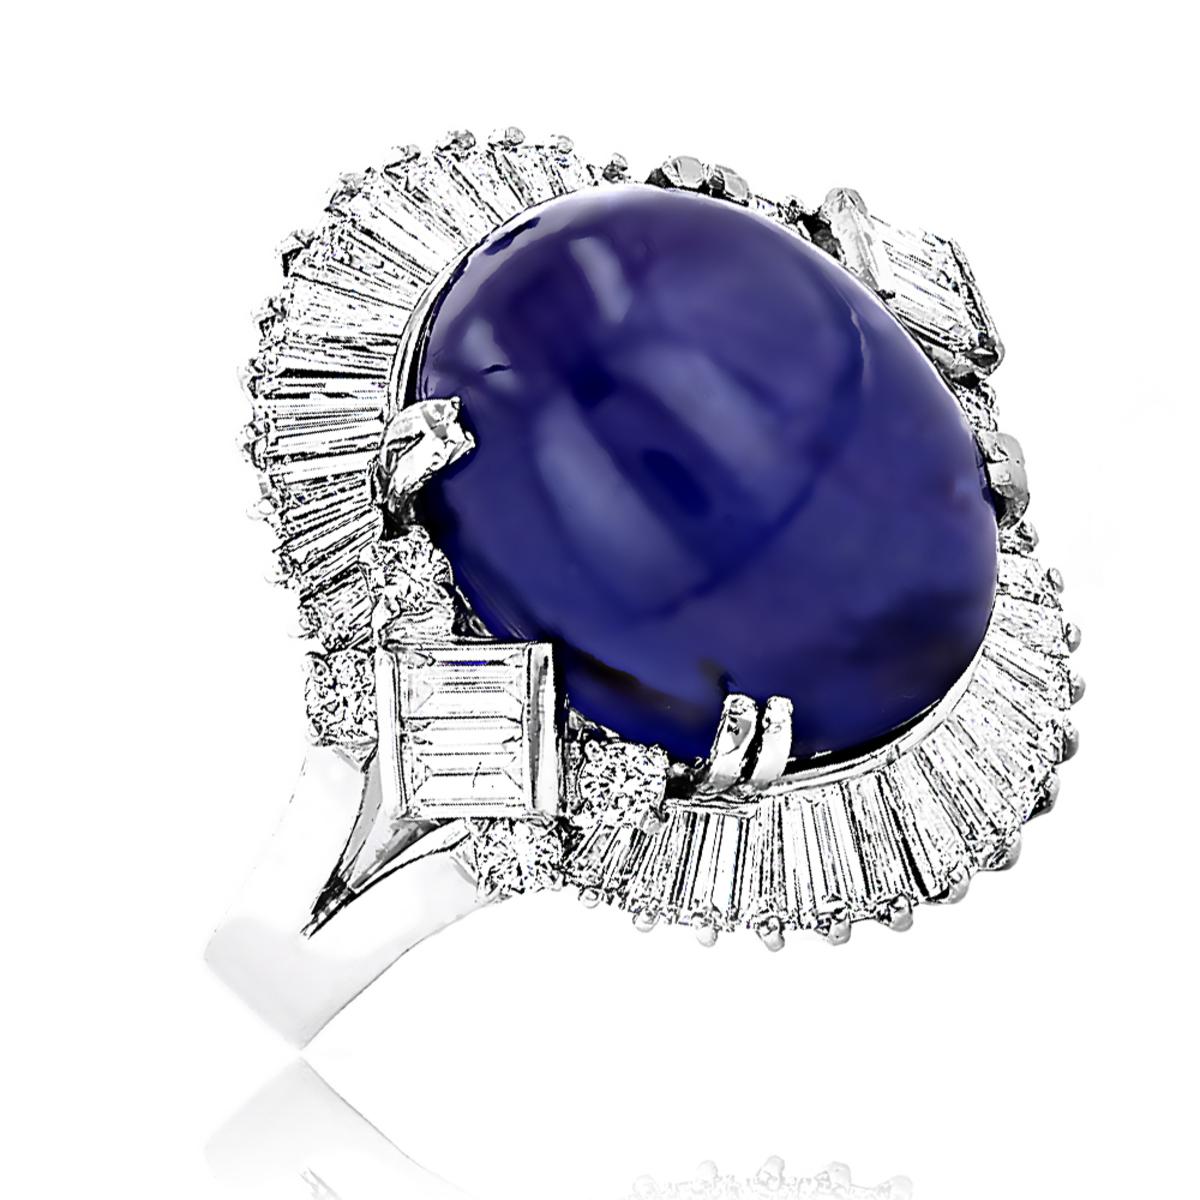 Vintage Estate Jewelry: Unique Women's Platinum Star Sapphire Diamond Ring